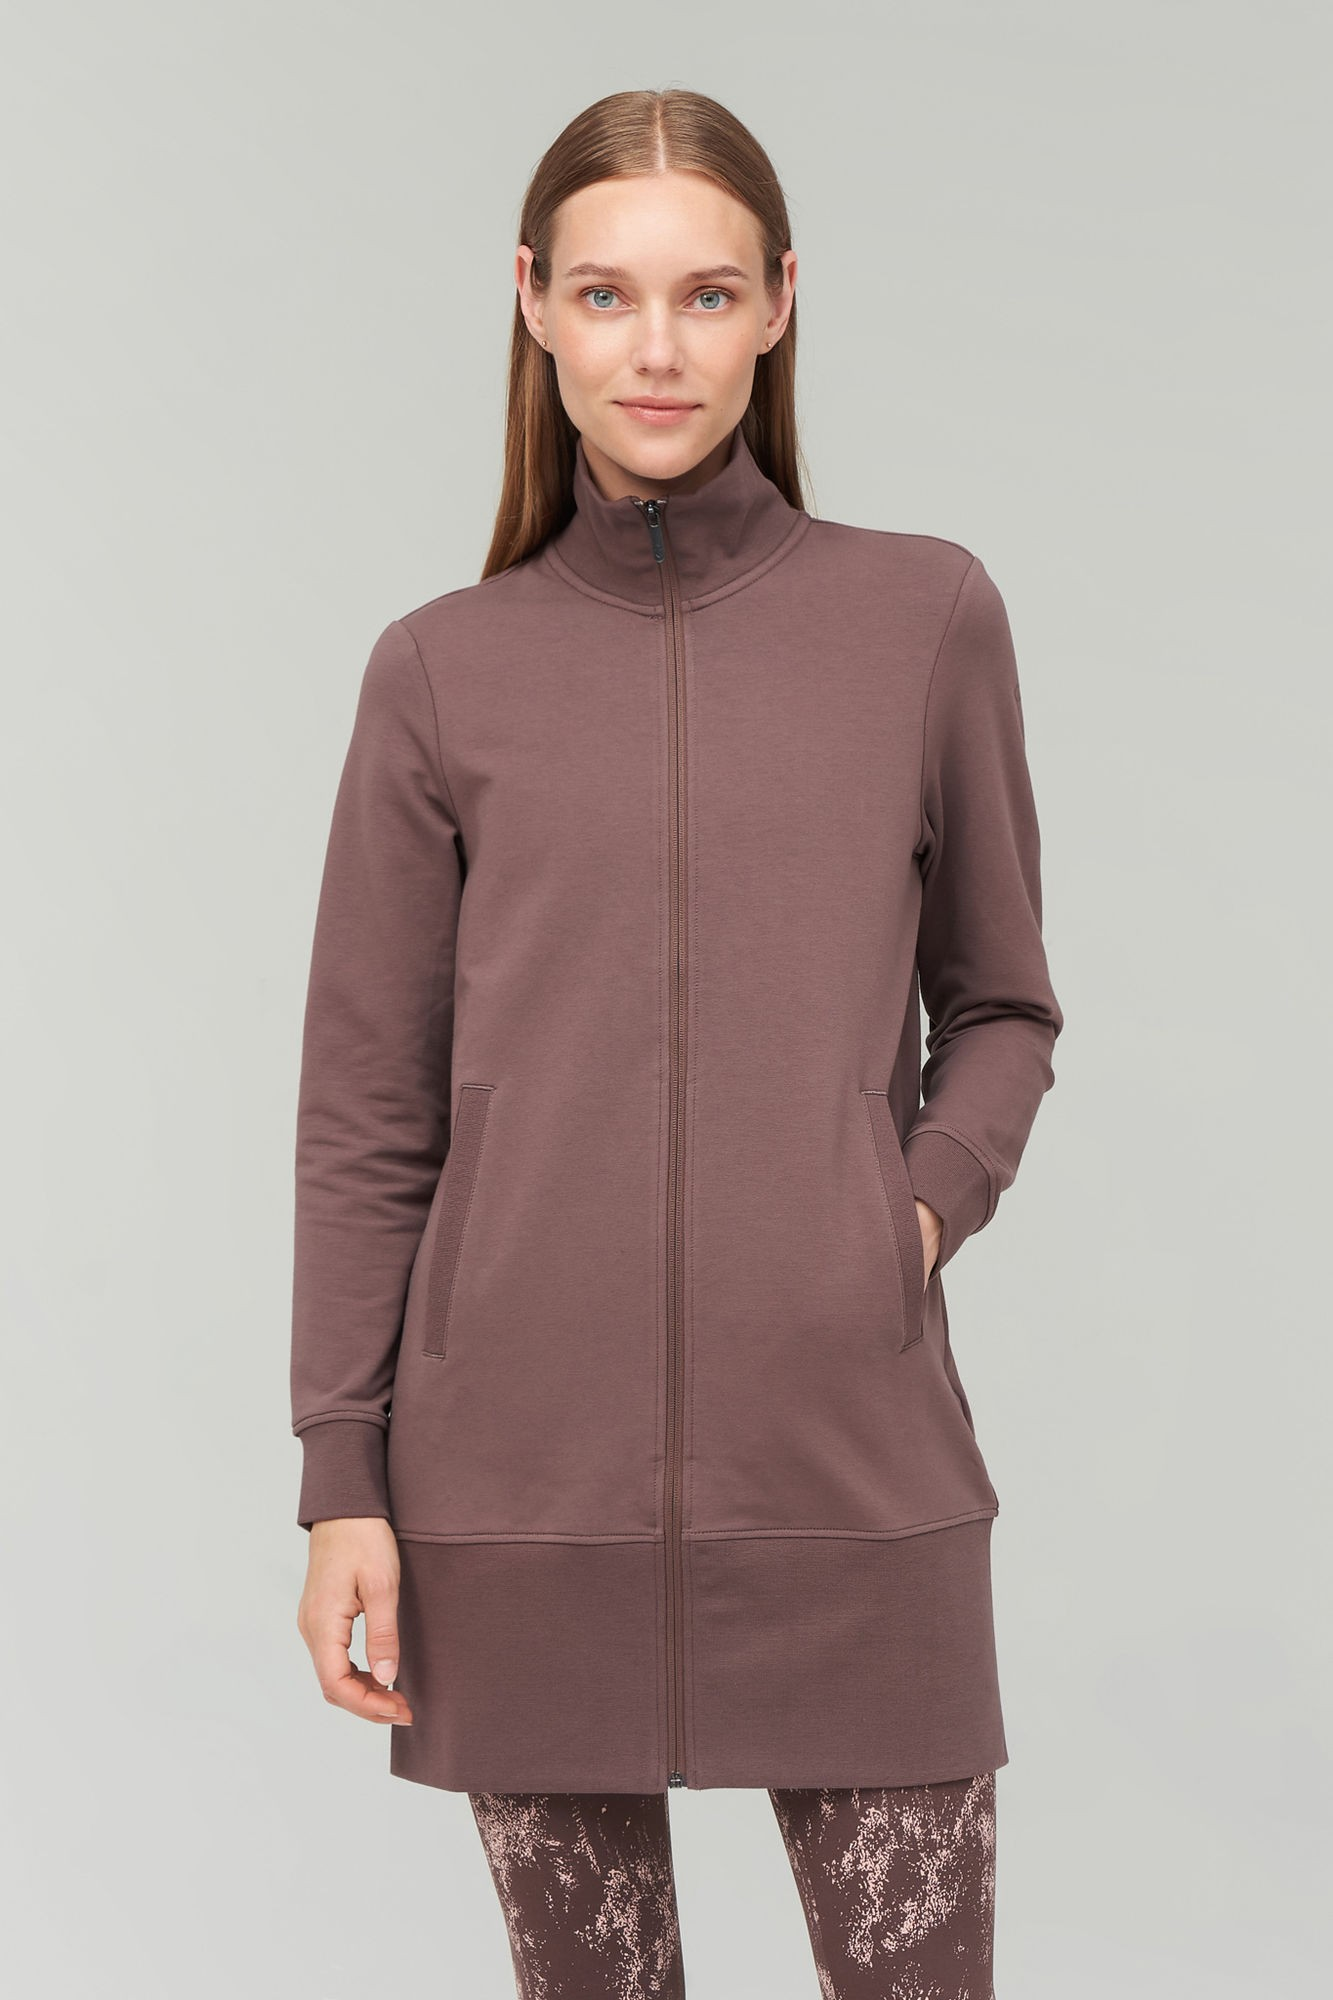 AUDIMAS Atseg.ilgas medvilninis džemperis 2021-219 Peppercorn S